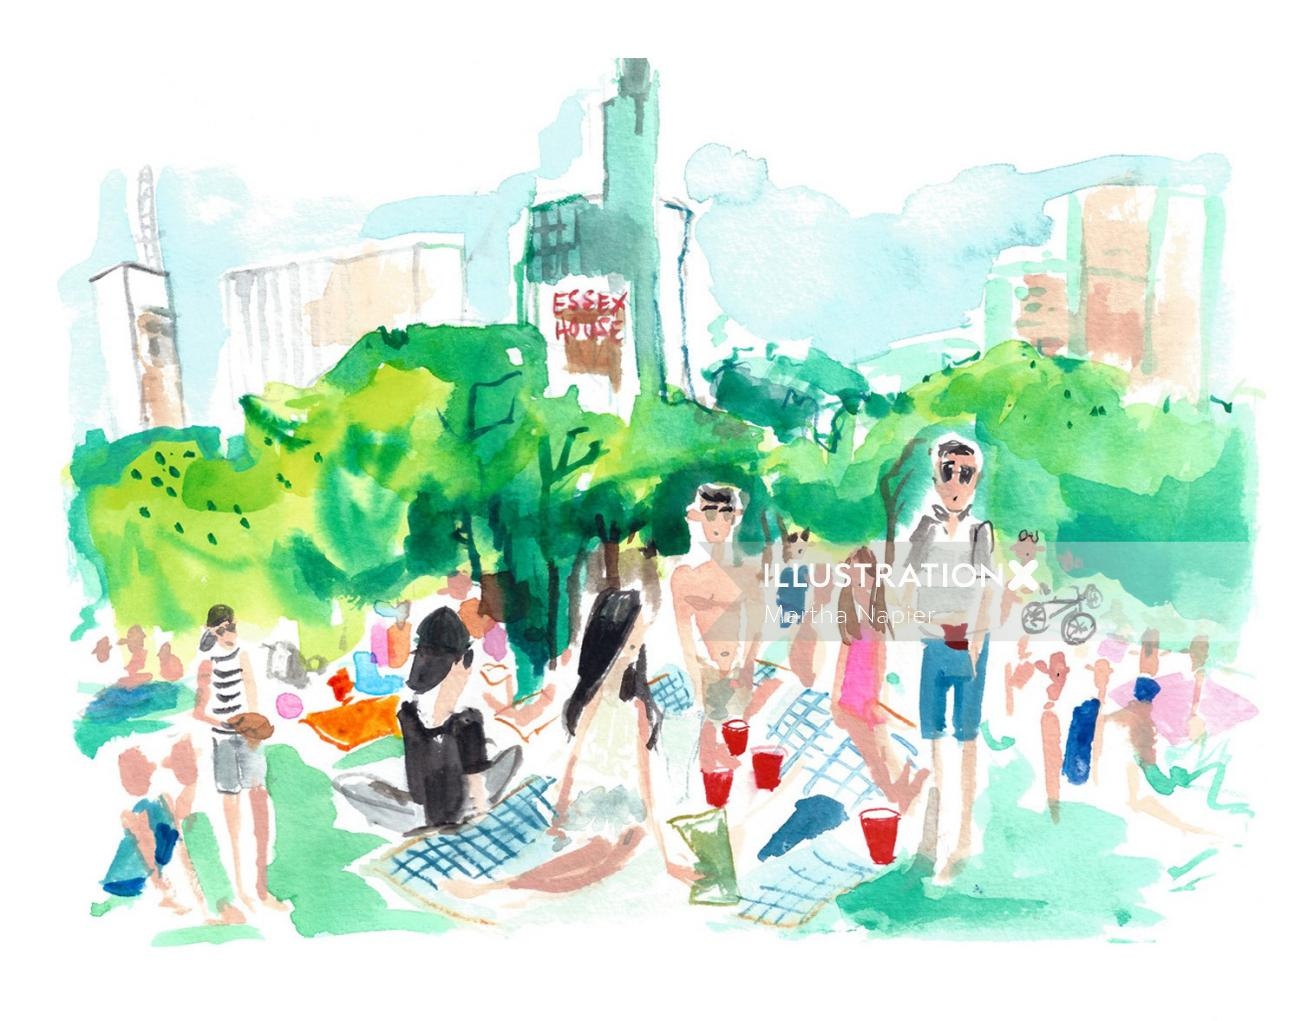 Illustration of New York city's central park